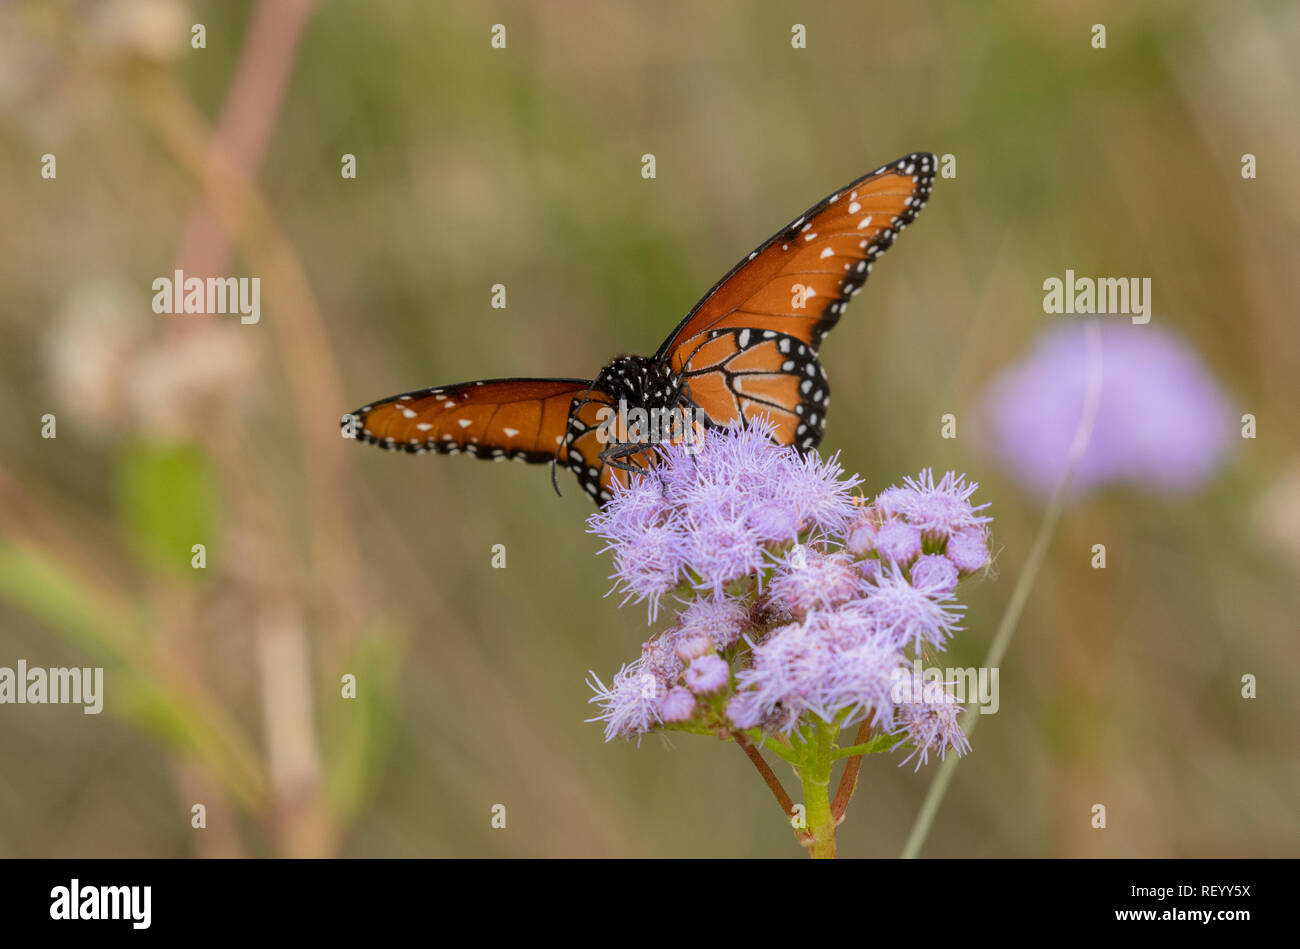 Queen butterfly, Danaus gilippus, feeding on flowers in winter, Texas - Stock Image